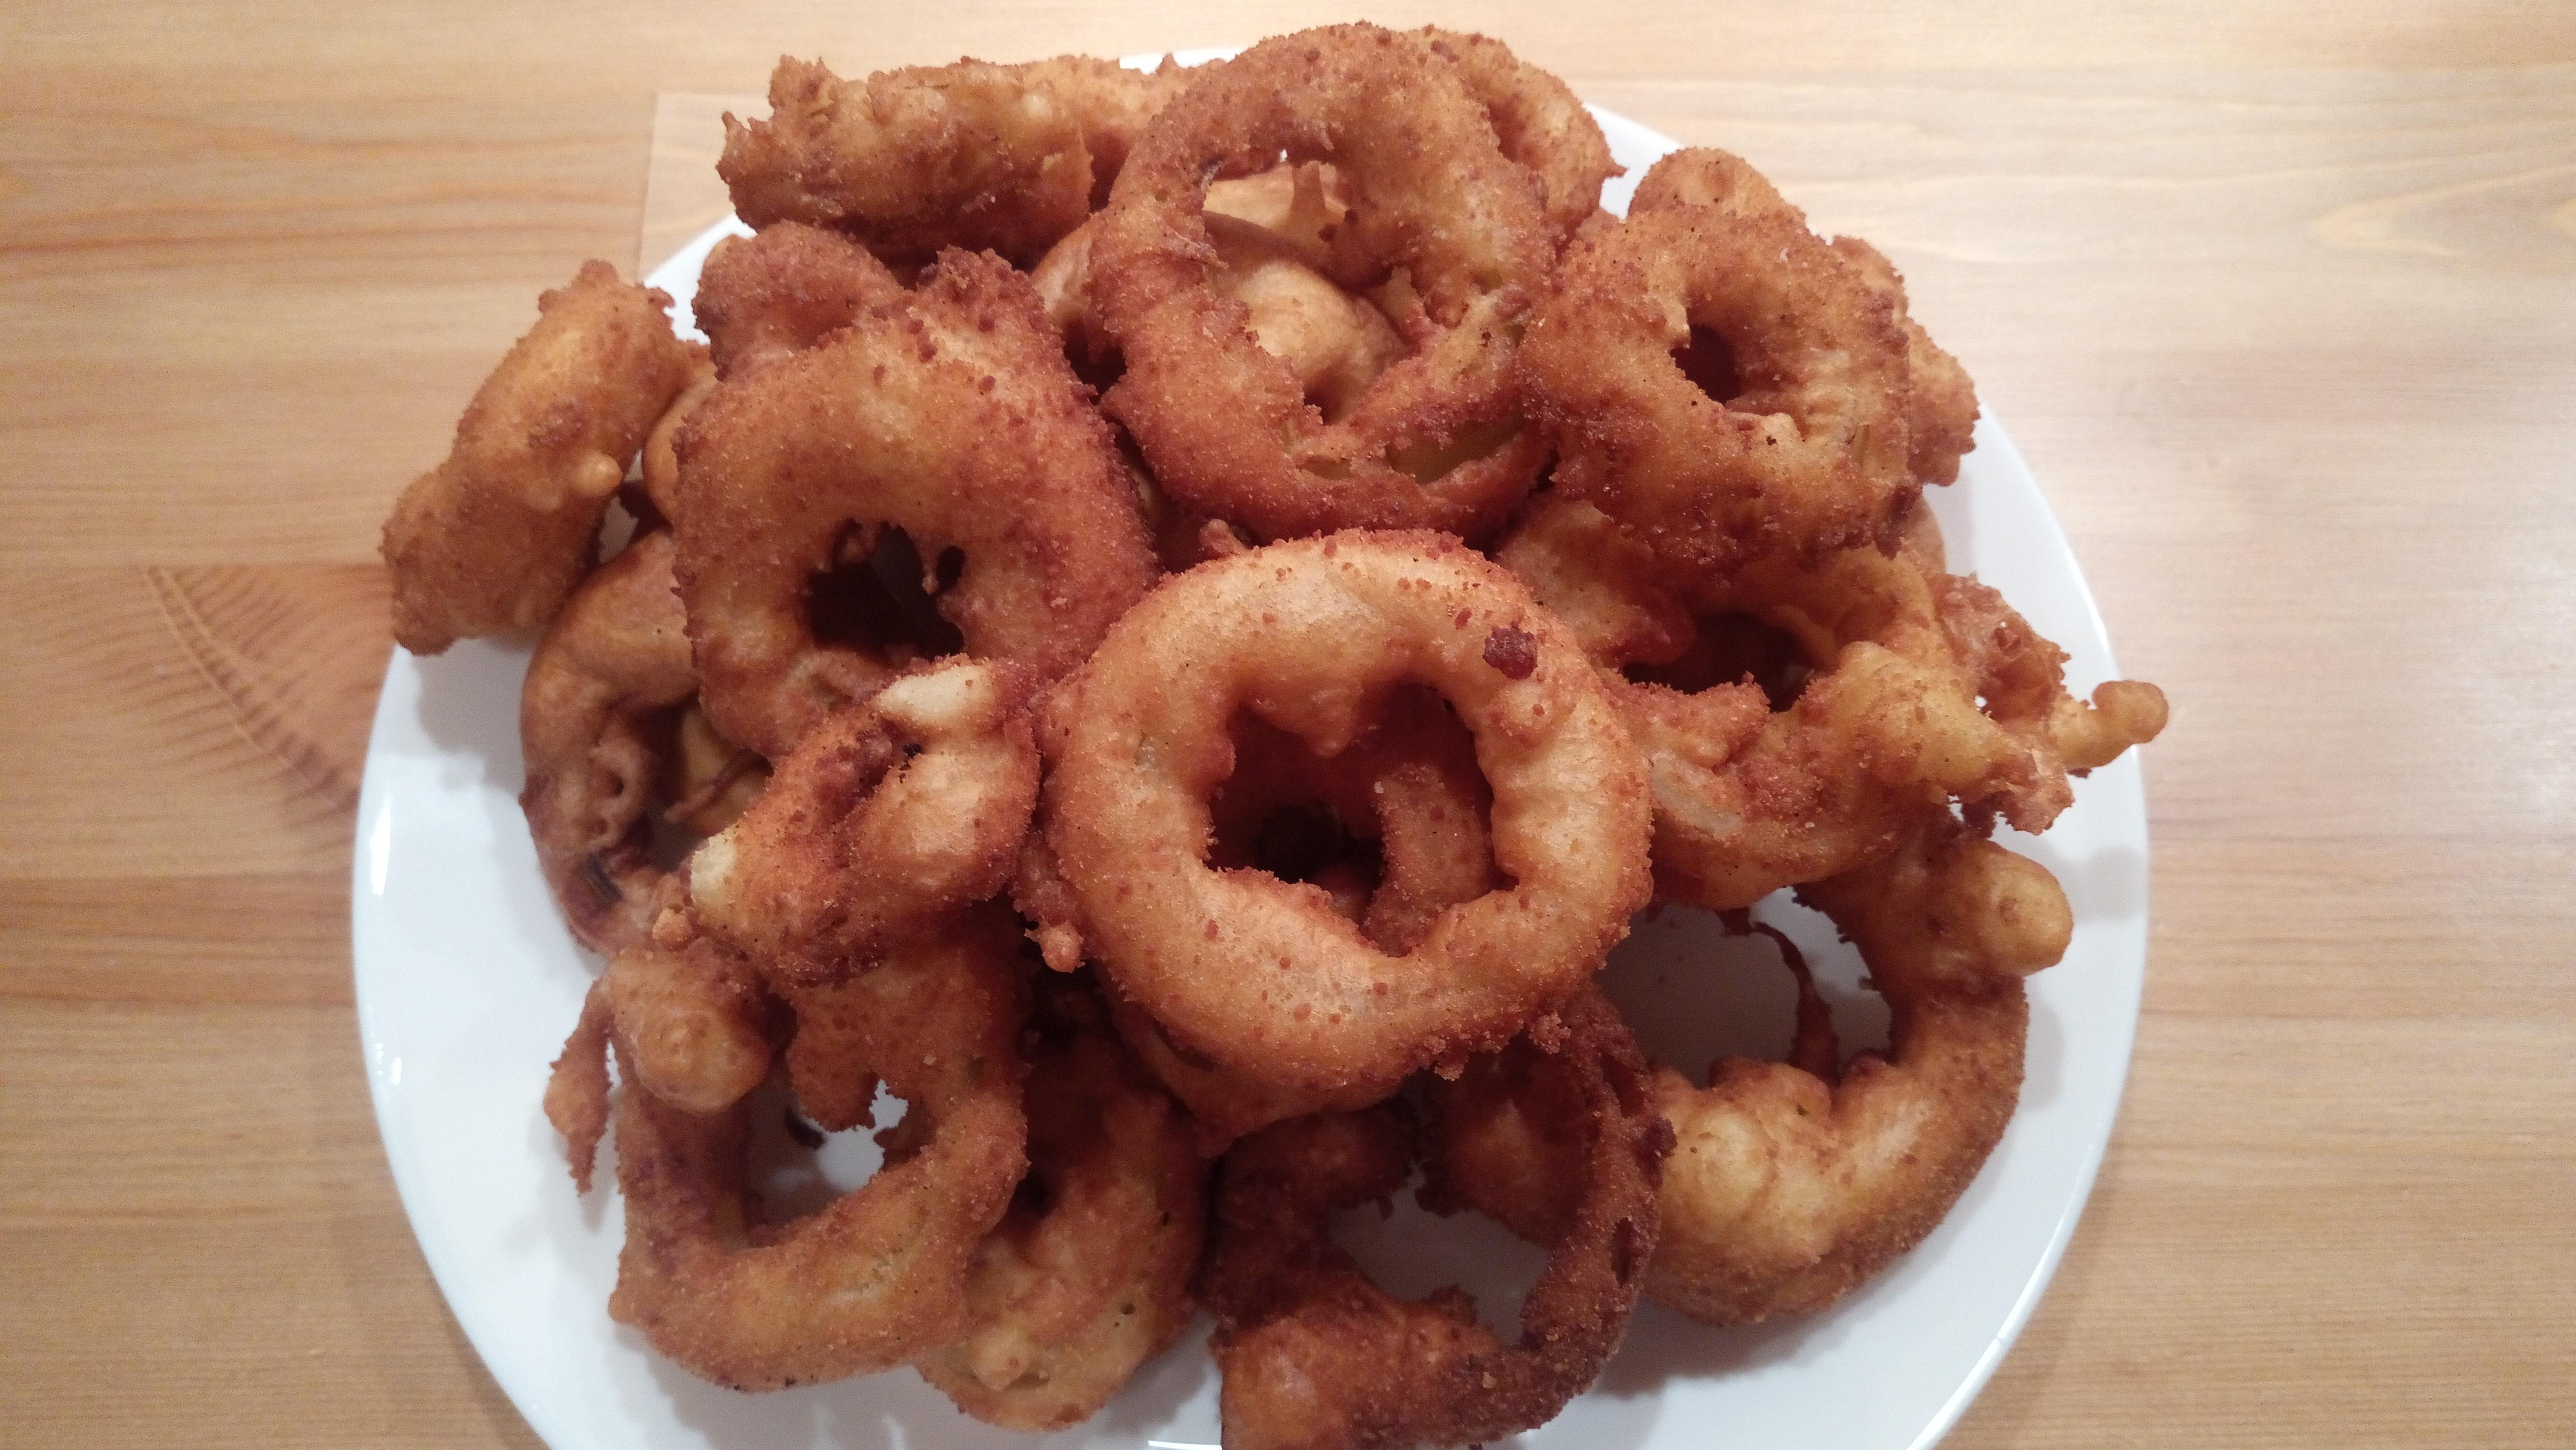 krązki cebulowe - onion rings